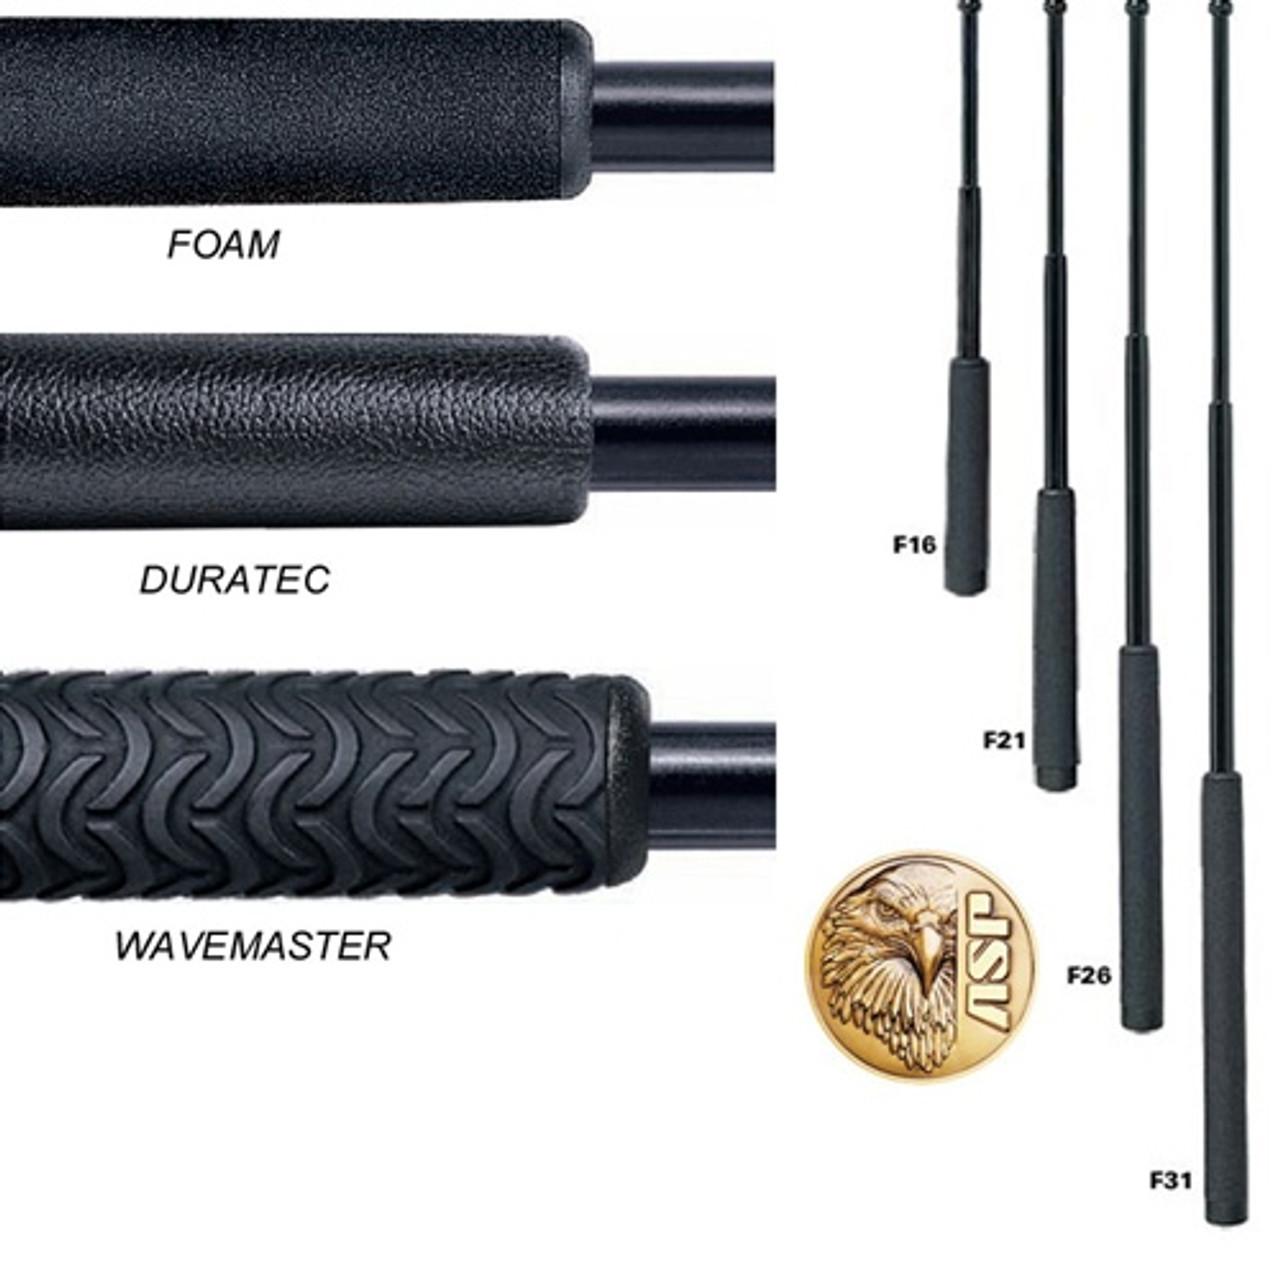 "ASP Expandable Friction Lock 26"" Baton, Chrome, Foam Handle,  F26, 52610"